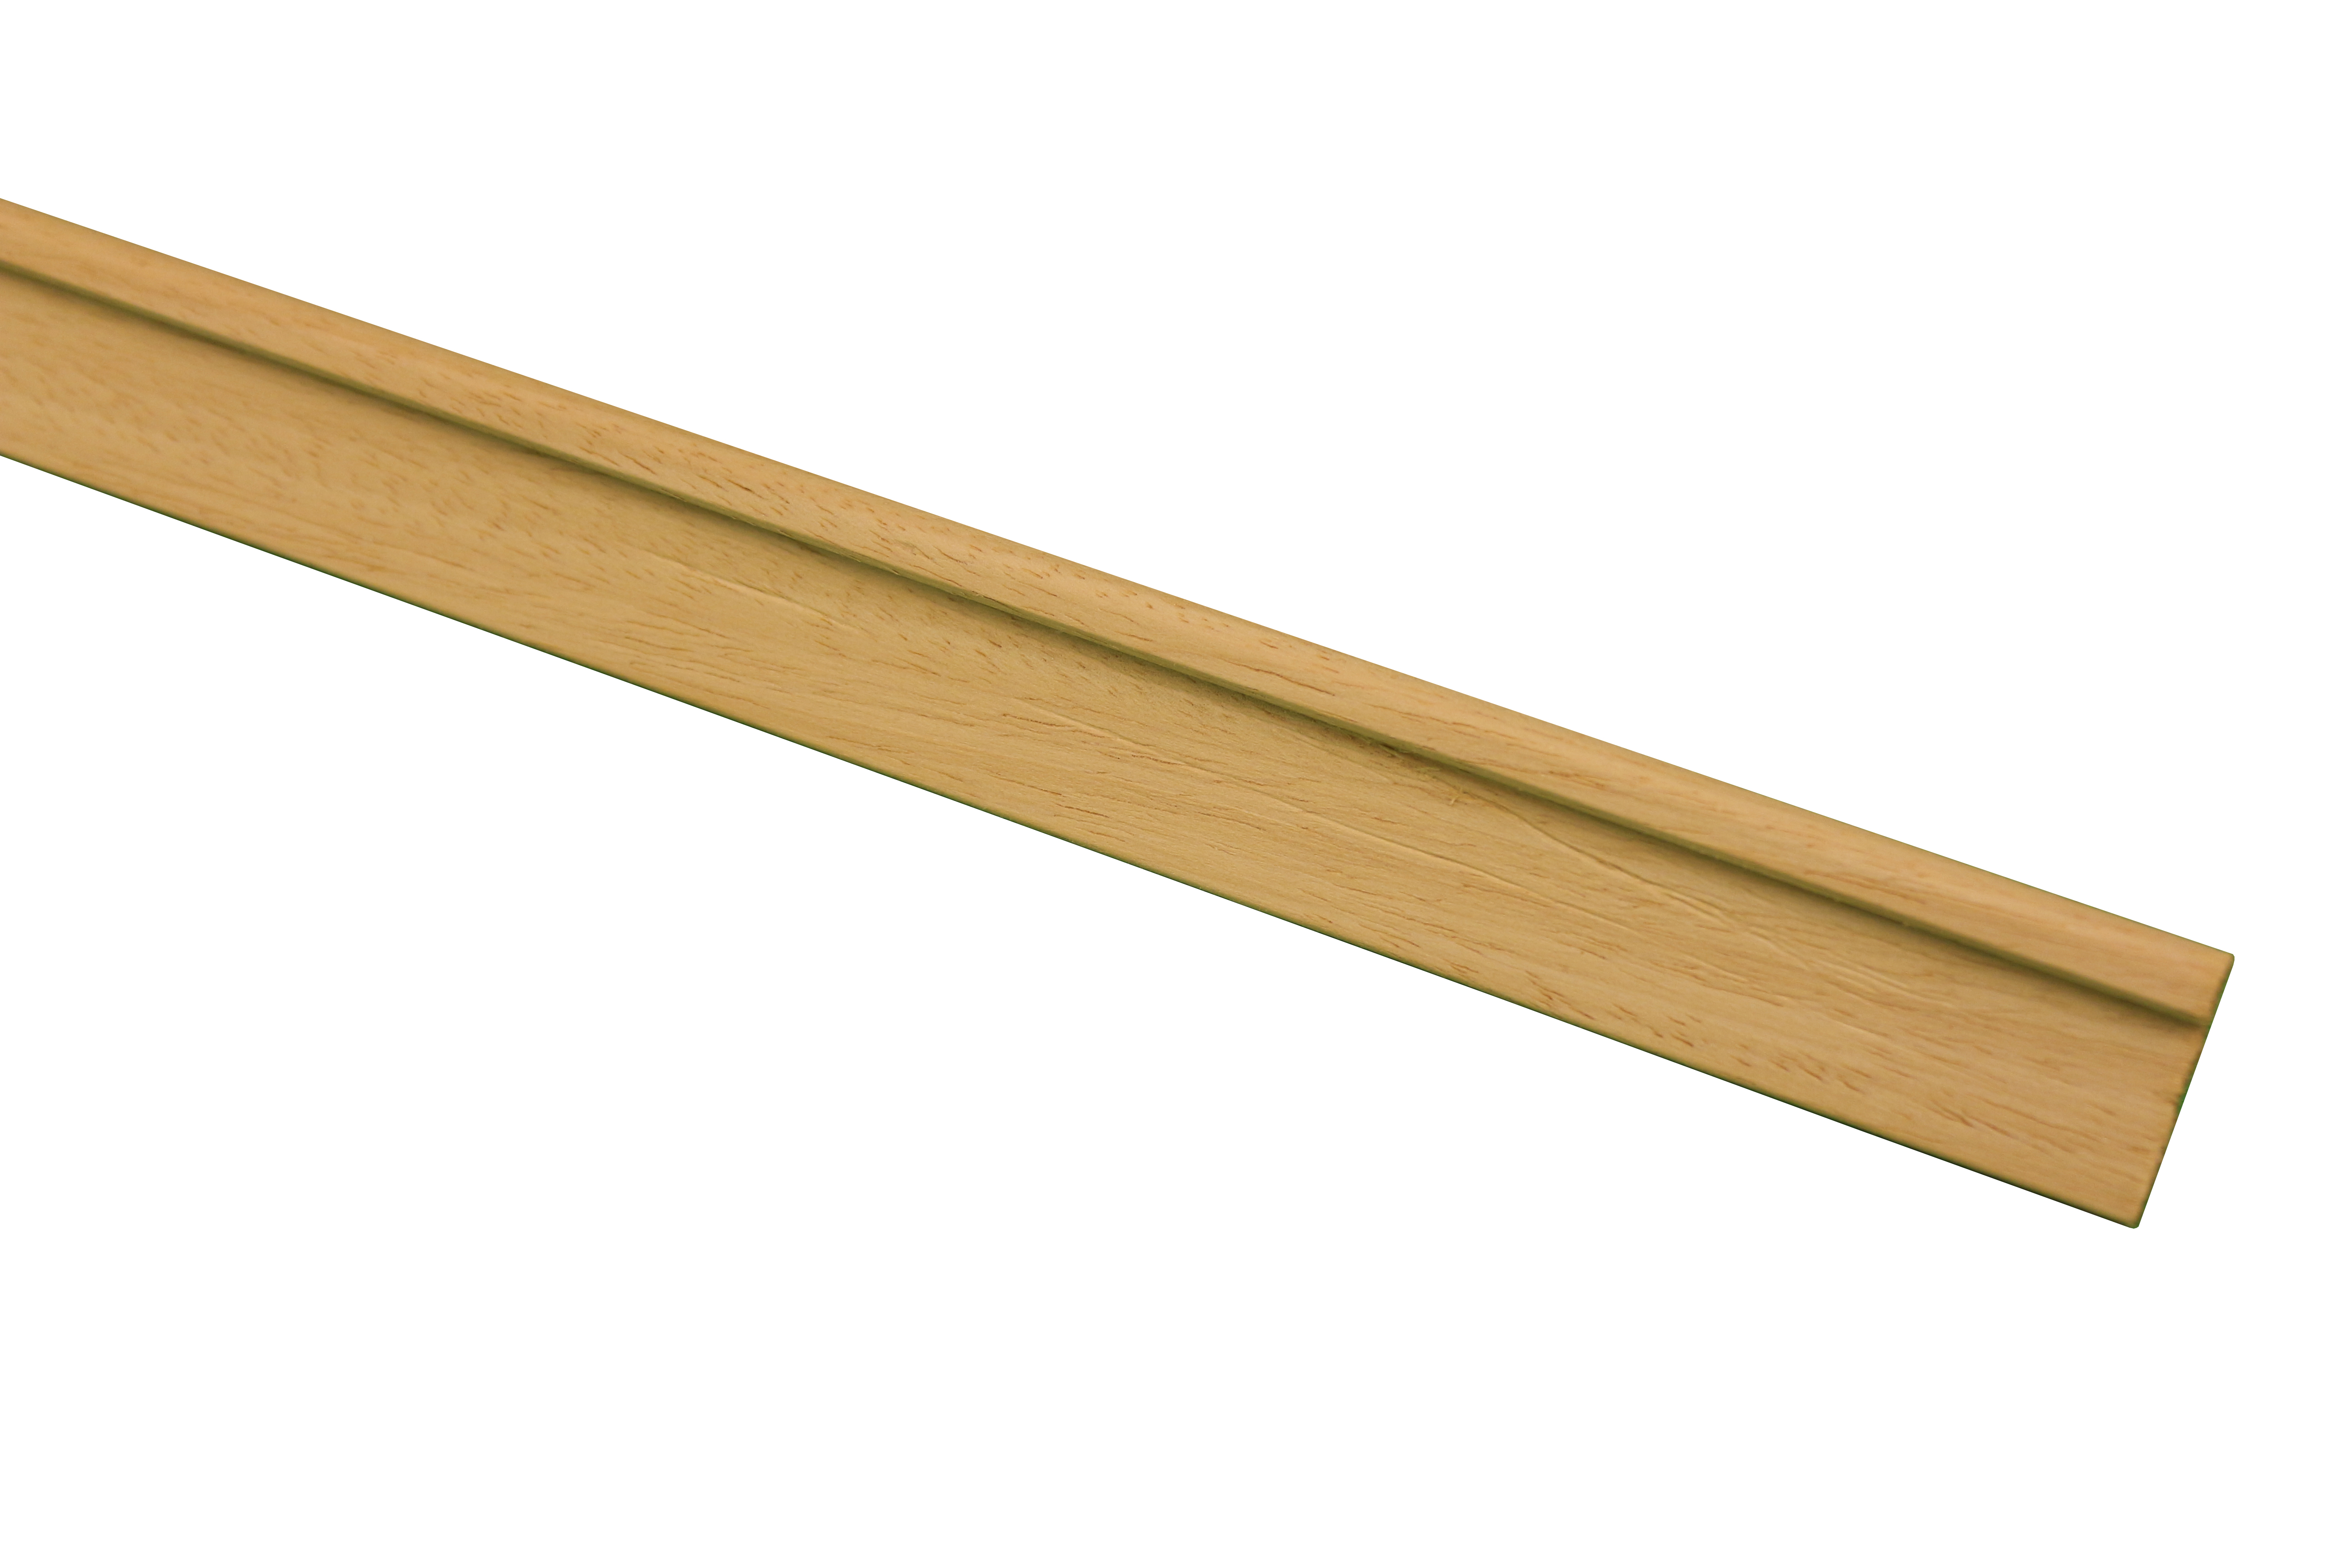 15 Light Hardwood Hockey Mouldings 9 x 26 x 2400mm